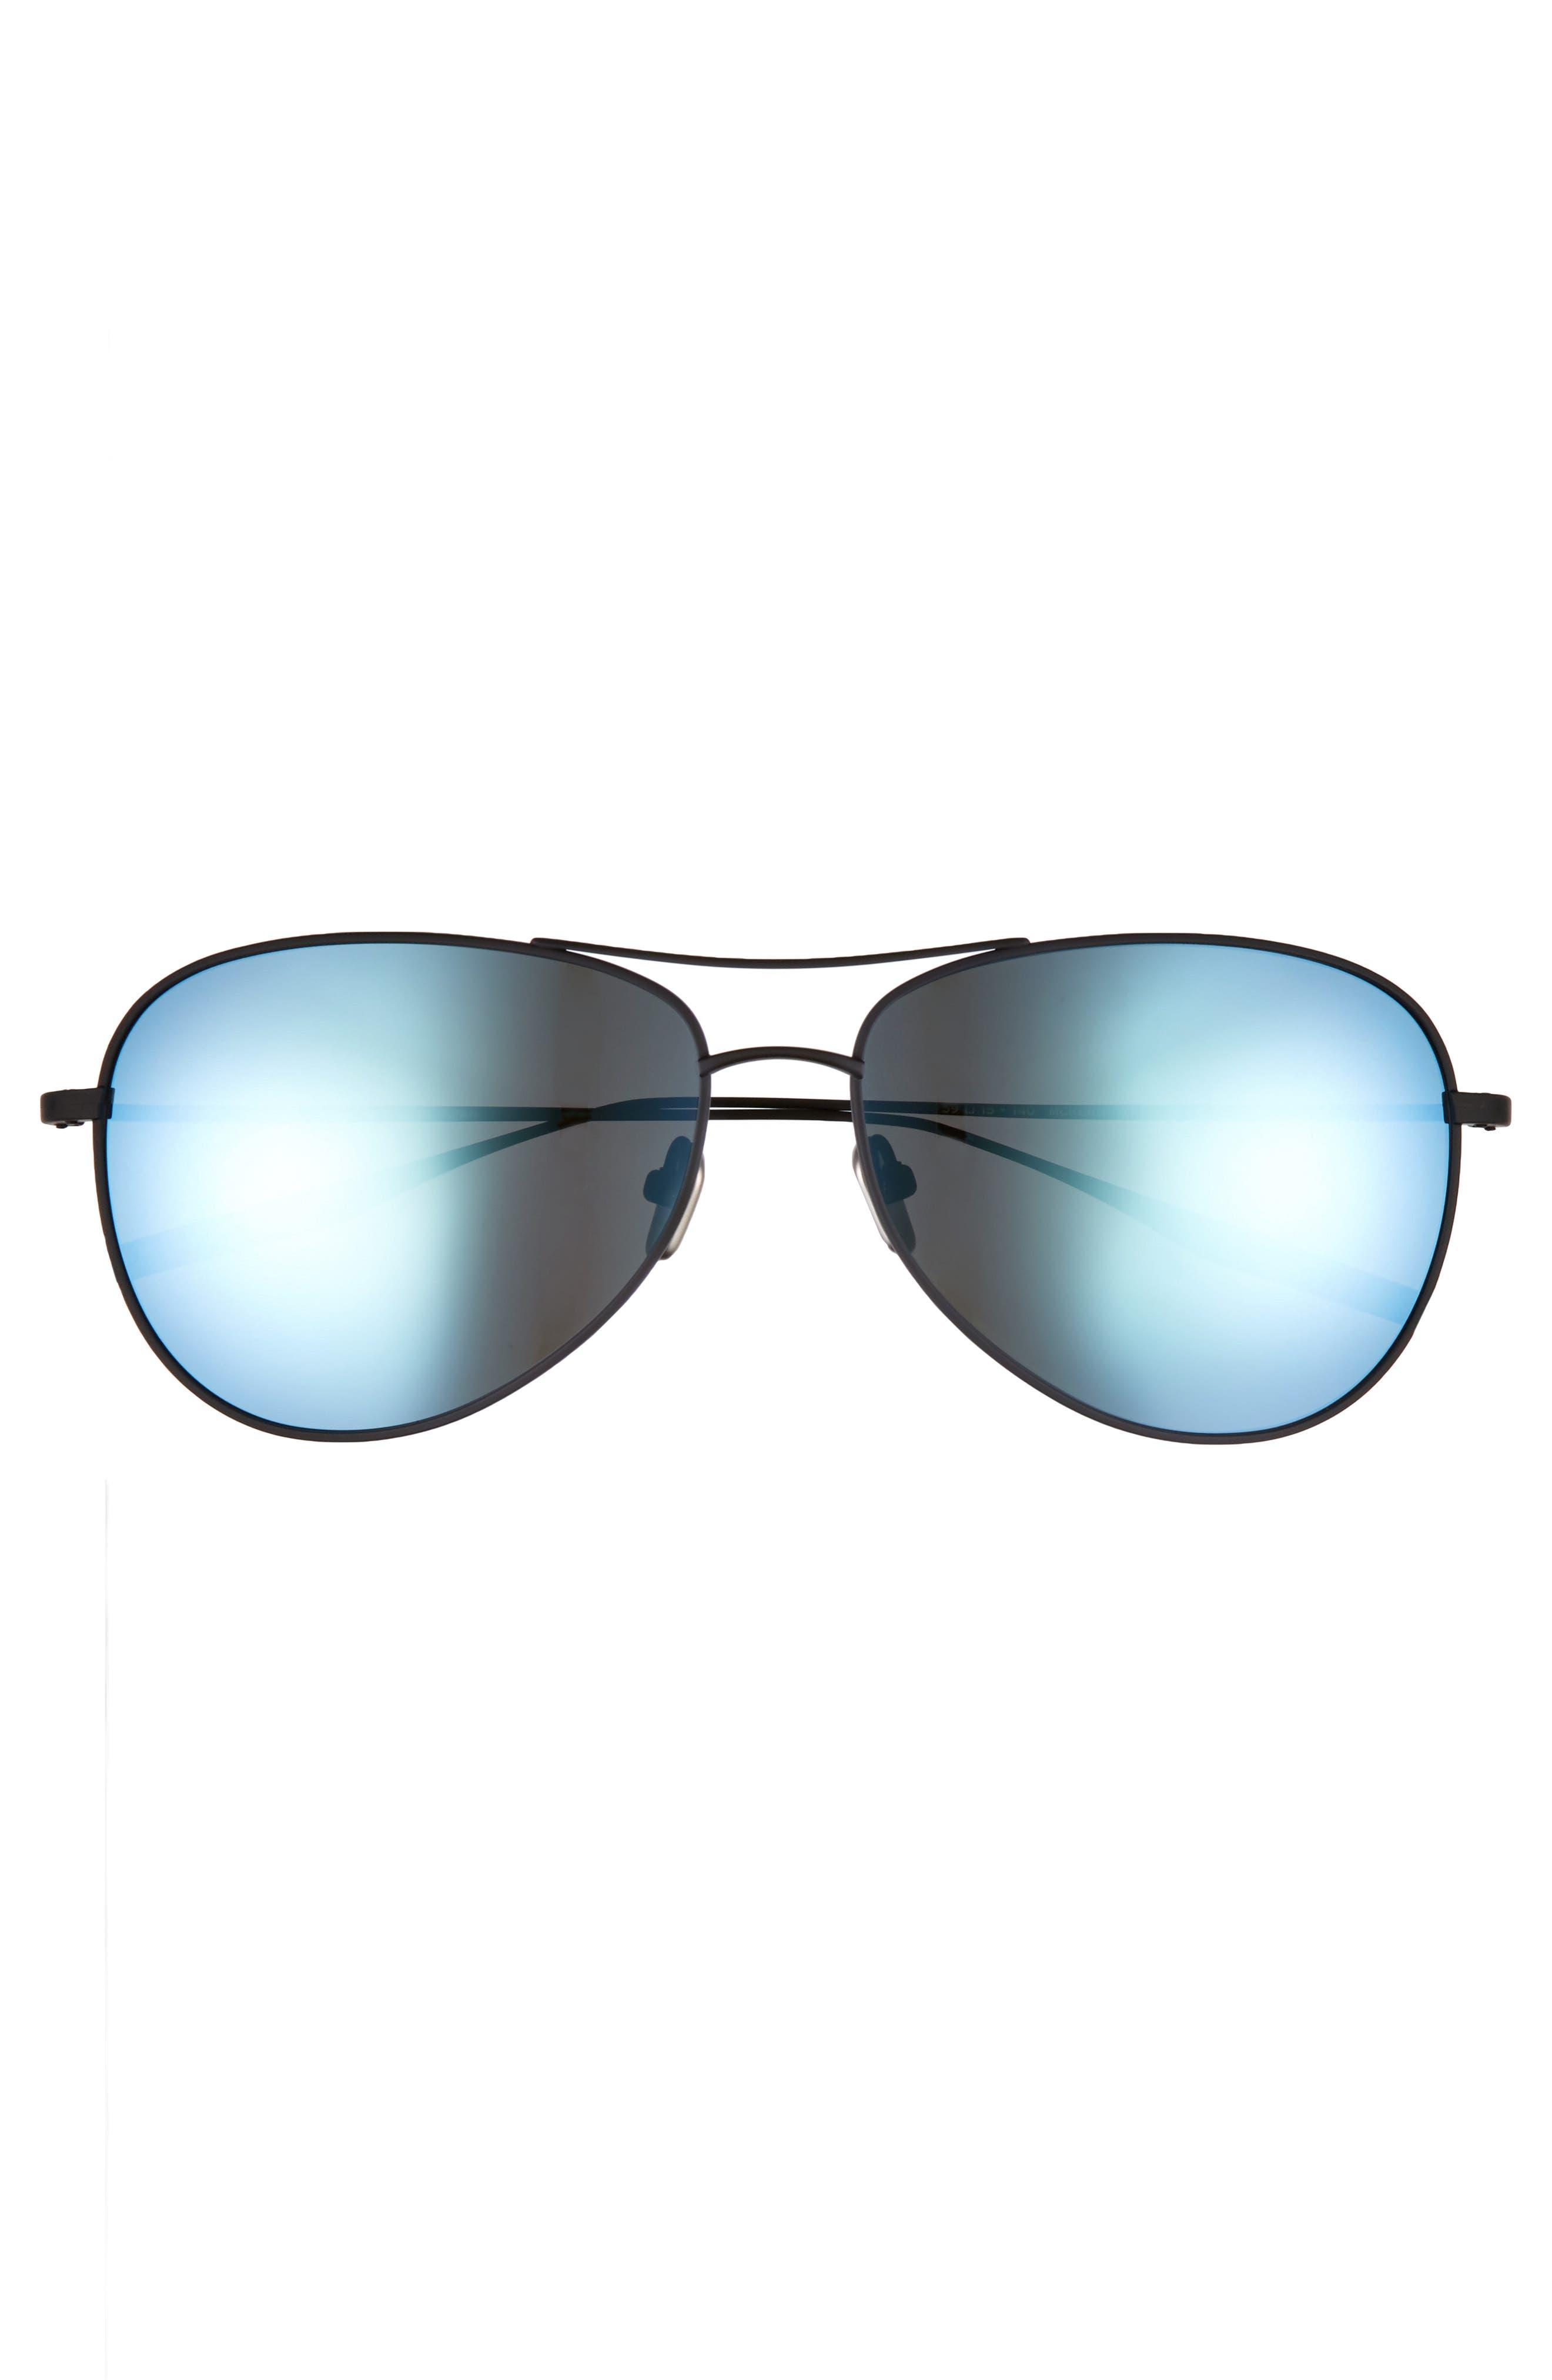 McKean 59mm Aviator Sunglasses,                             Alternate thumbnail 2, color,                             Black Sand / Mirror Blue